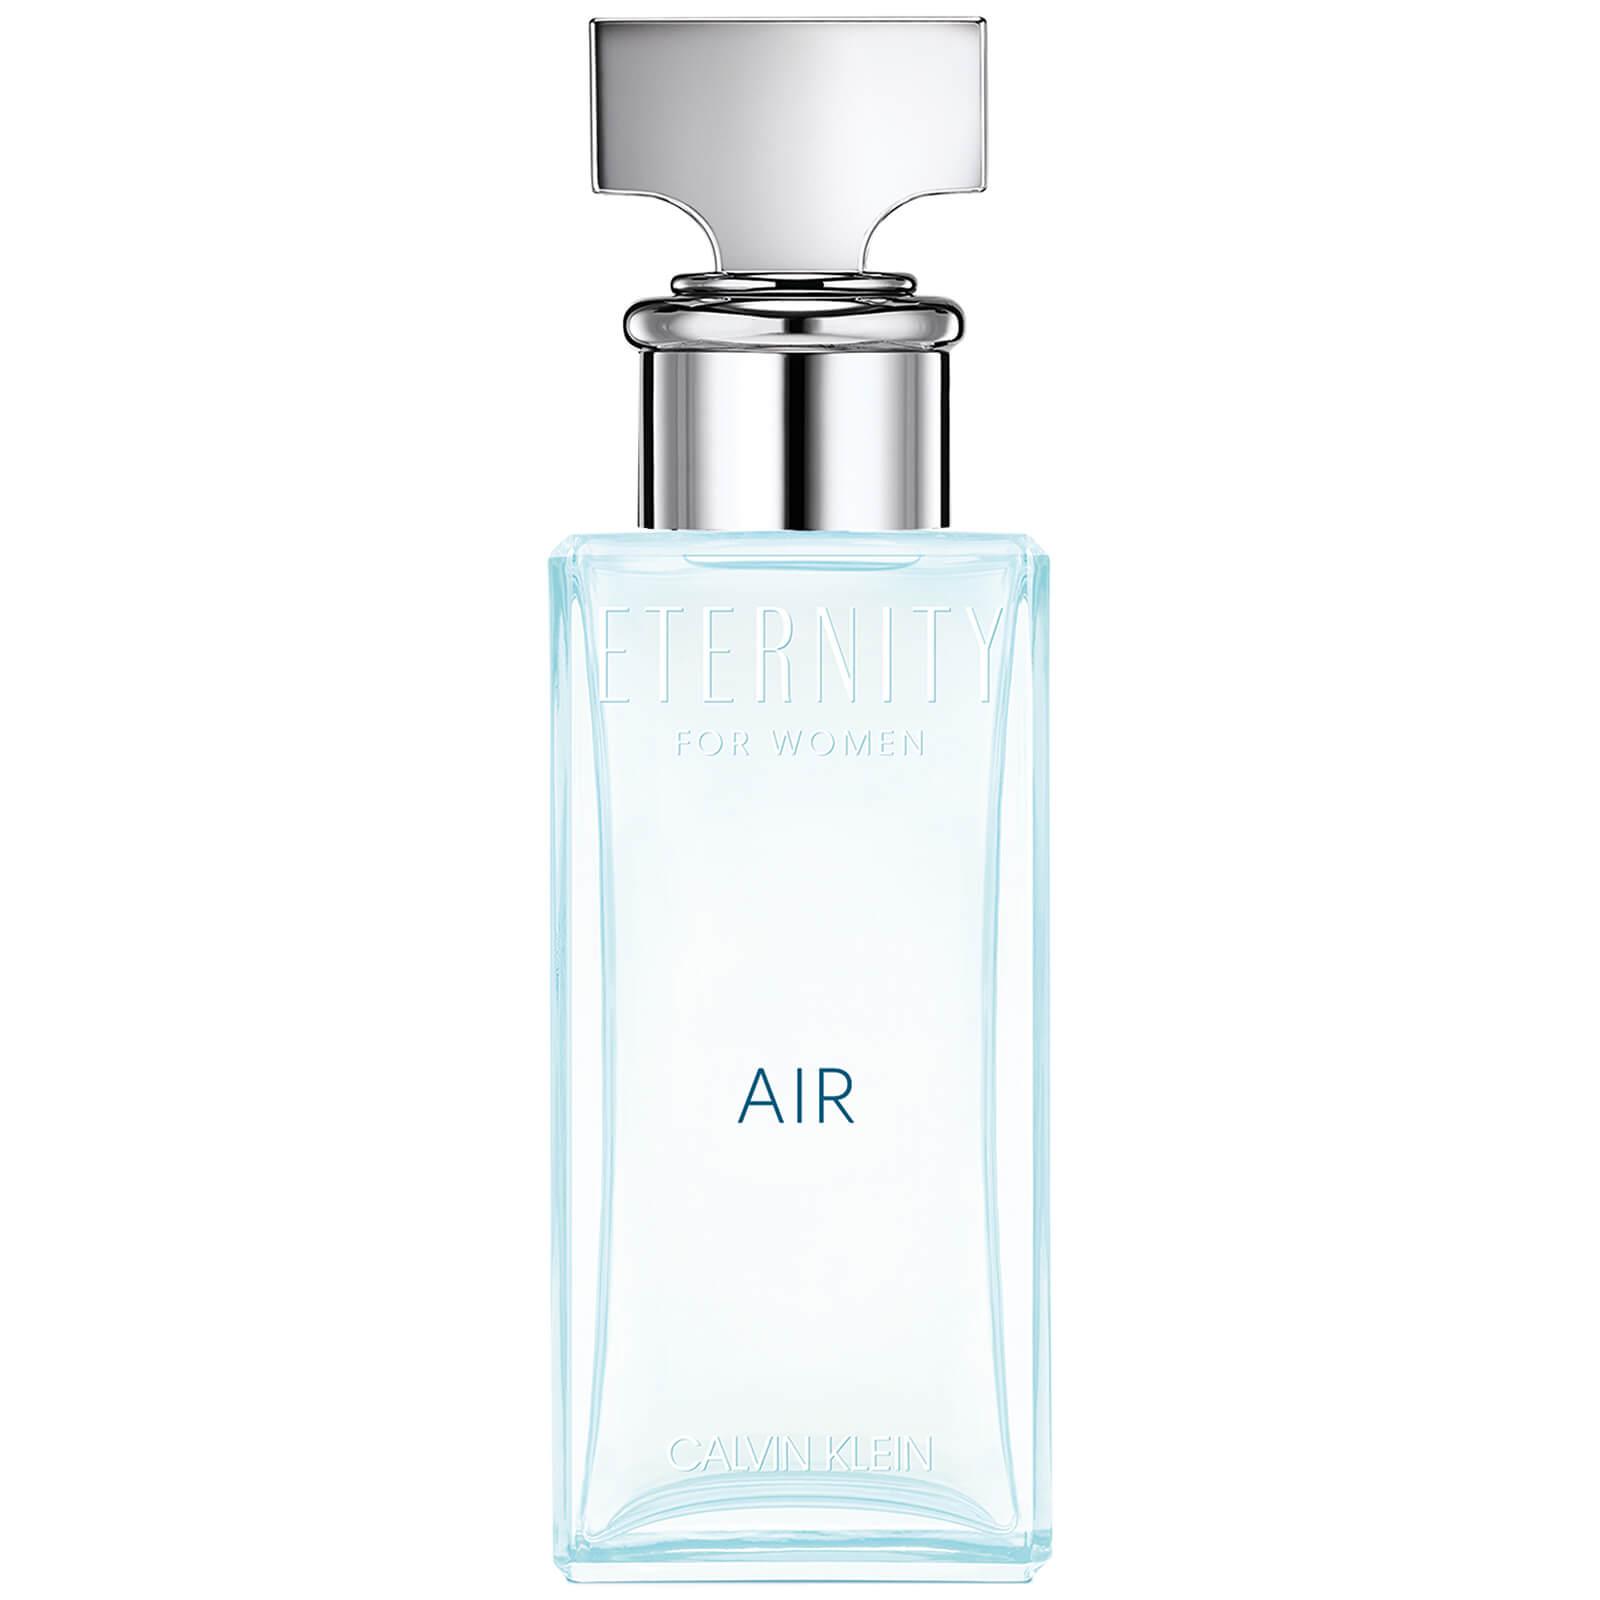 22edf9c29 Calvin Klein Eternity Air for Woman Eau de Parfum woda perfumowana 30 ml.  Opis